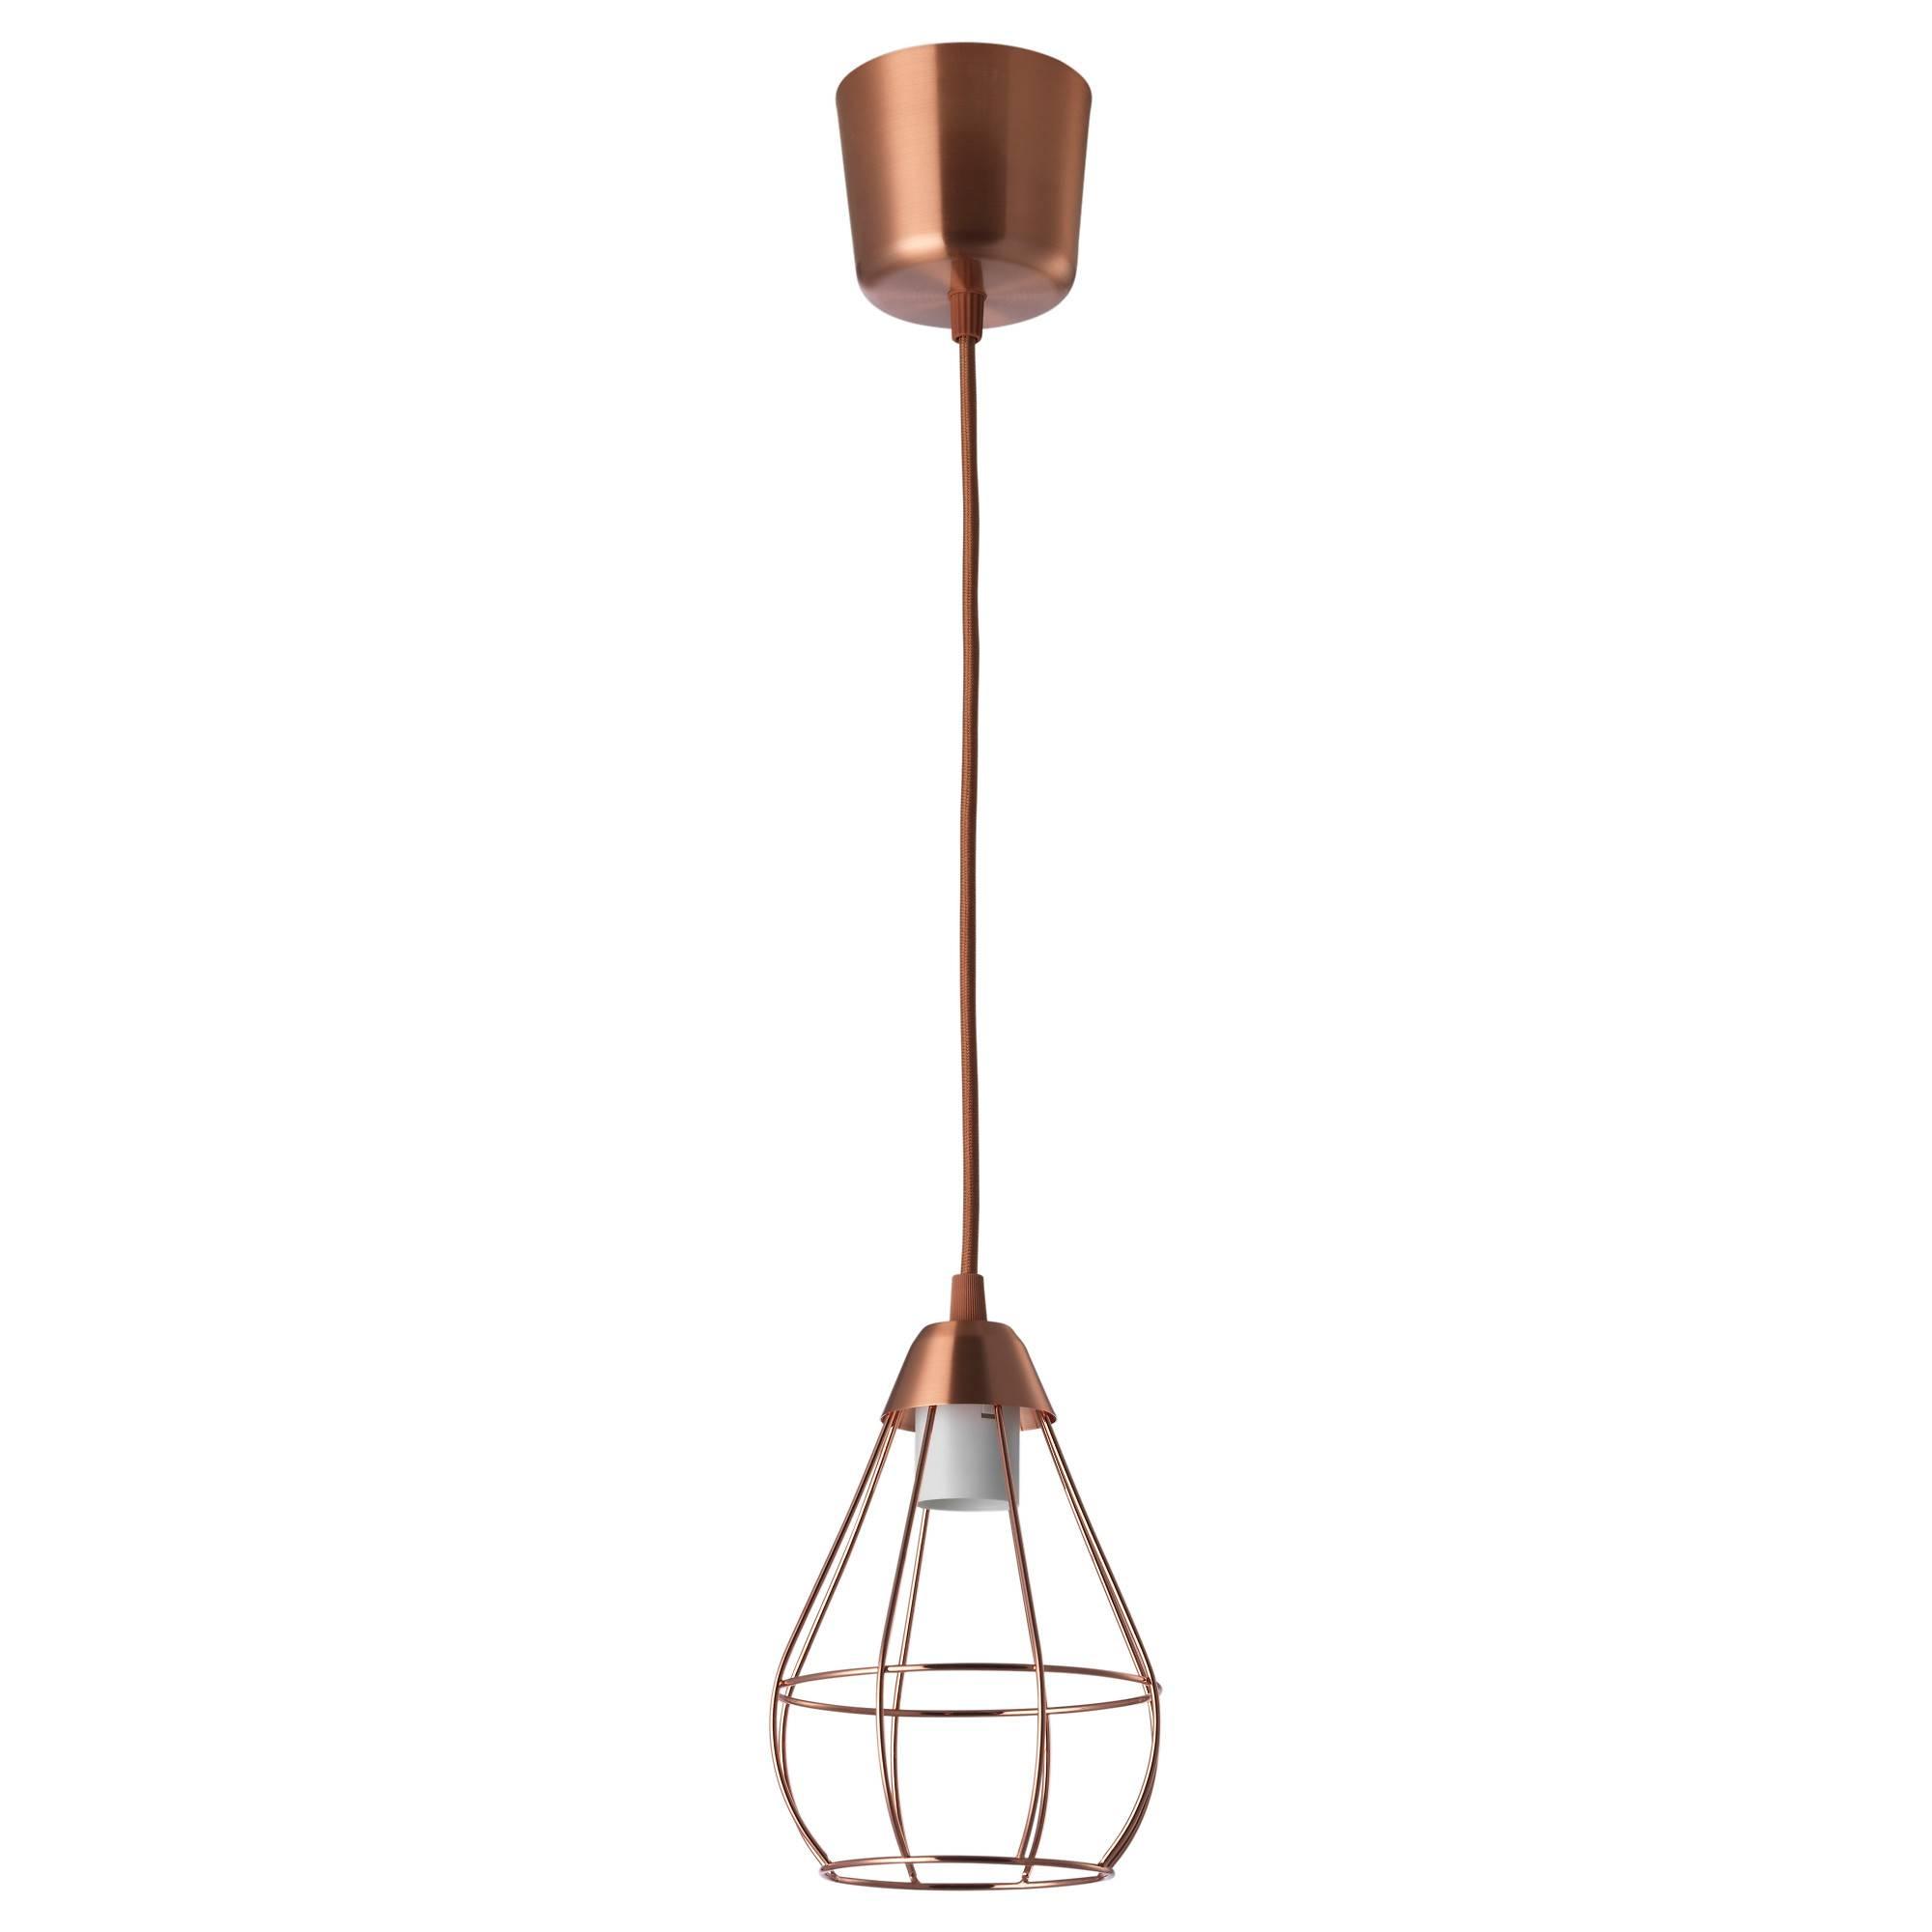 Slättbo Pendant Lamp Copper-Colour 14.5 Cm - Ikea regarding Ikea Ceiling Lights Fittings (Image 15 of 15)